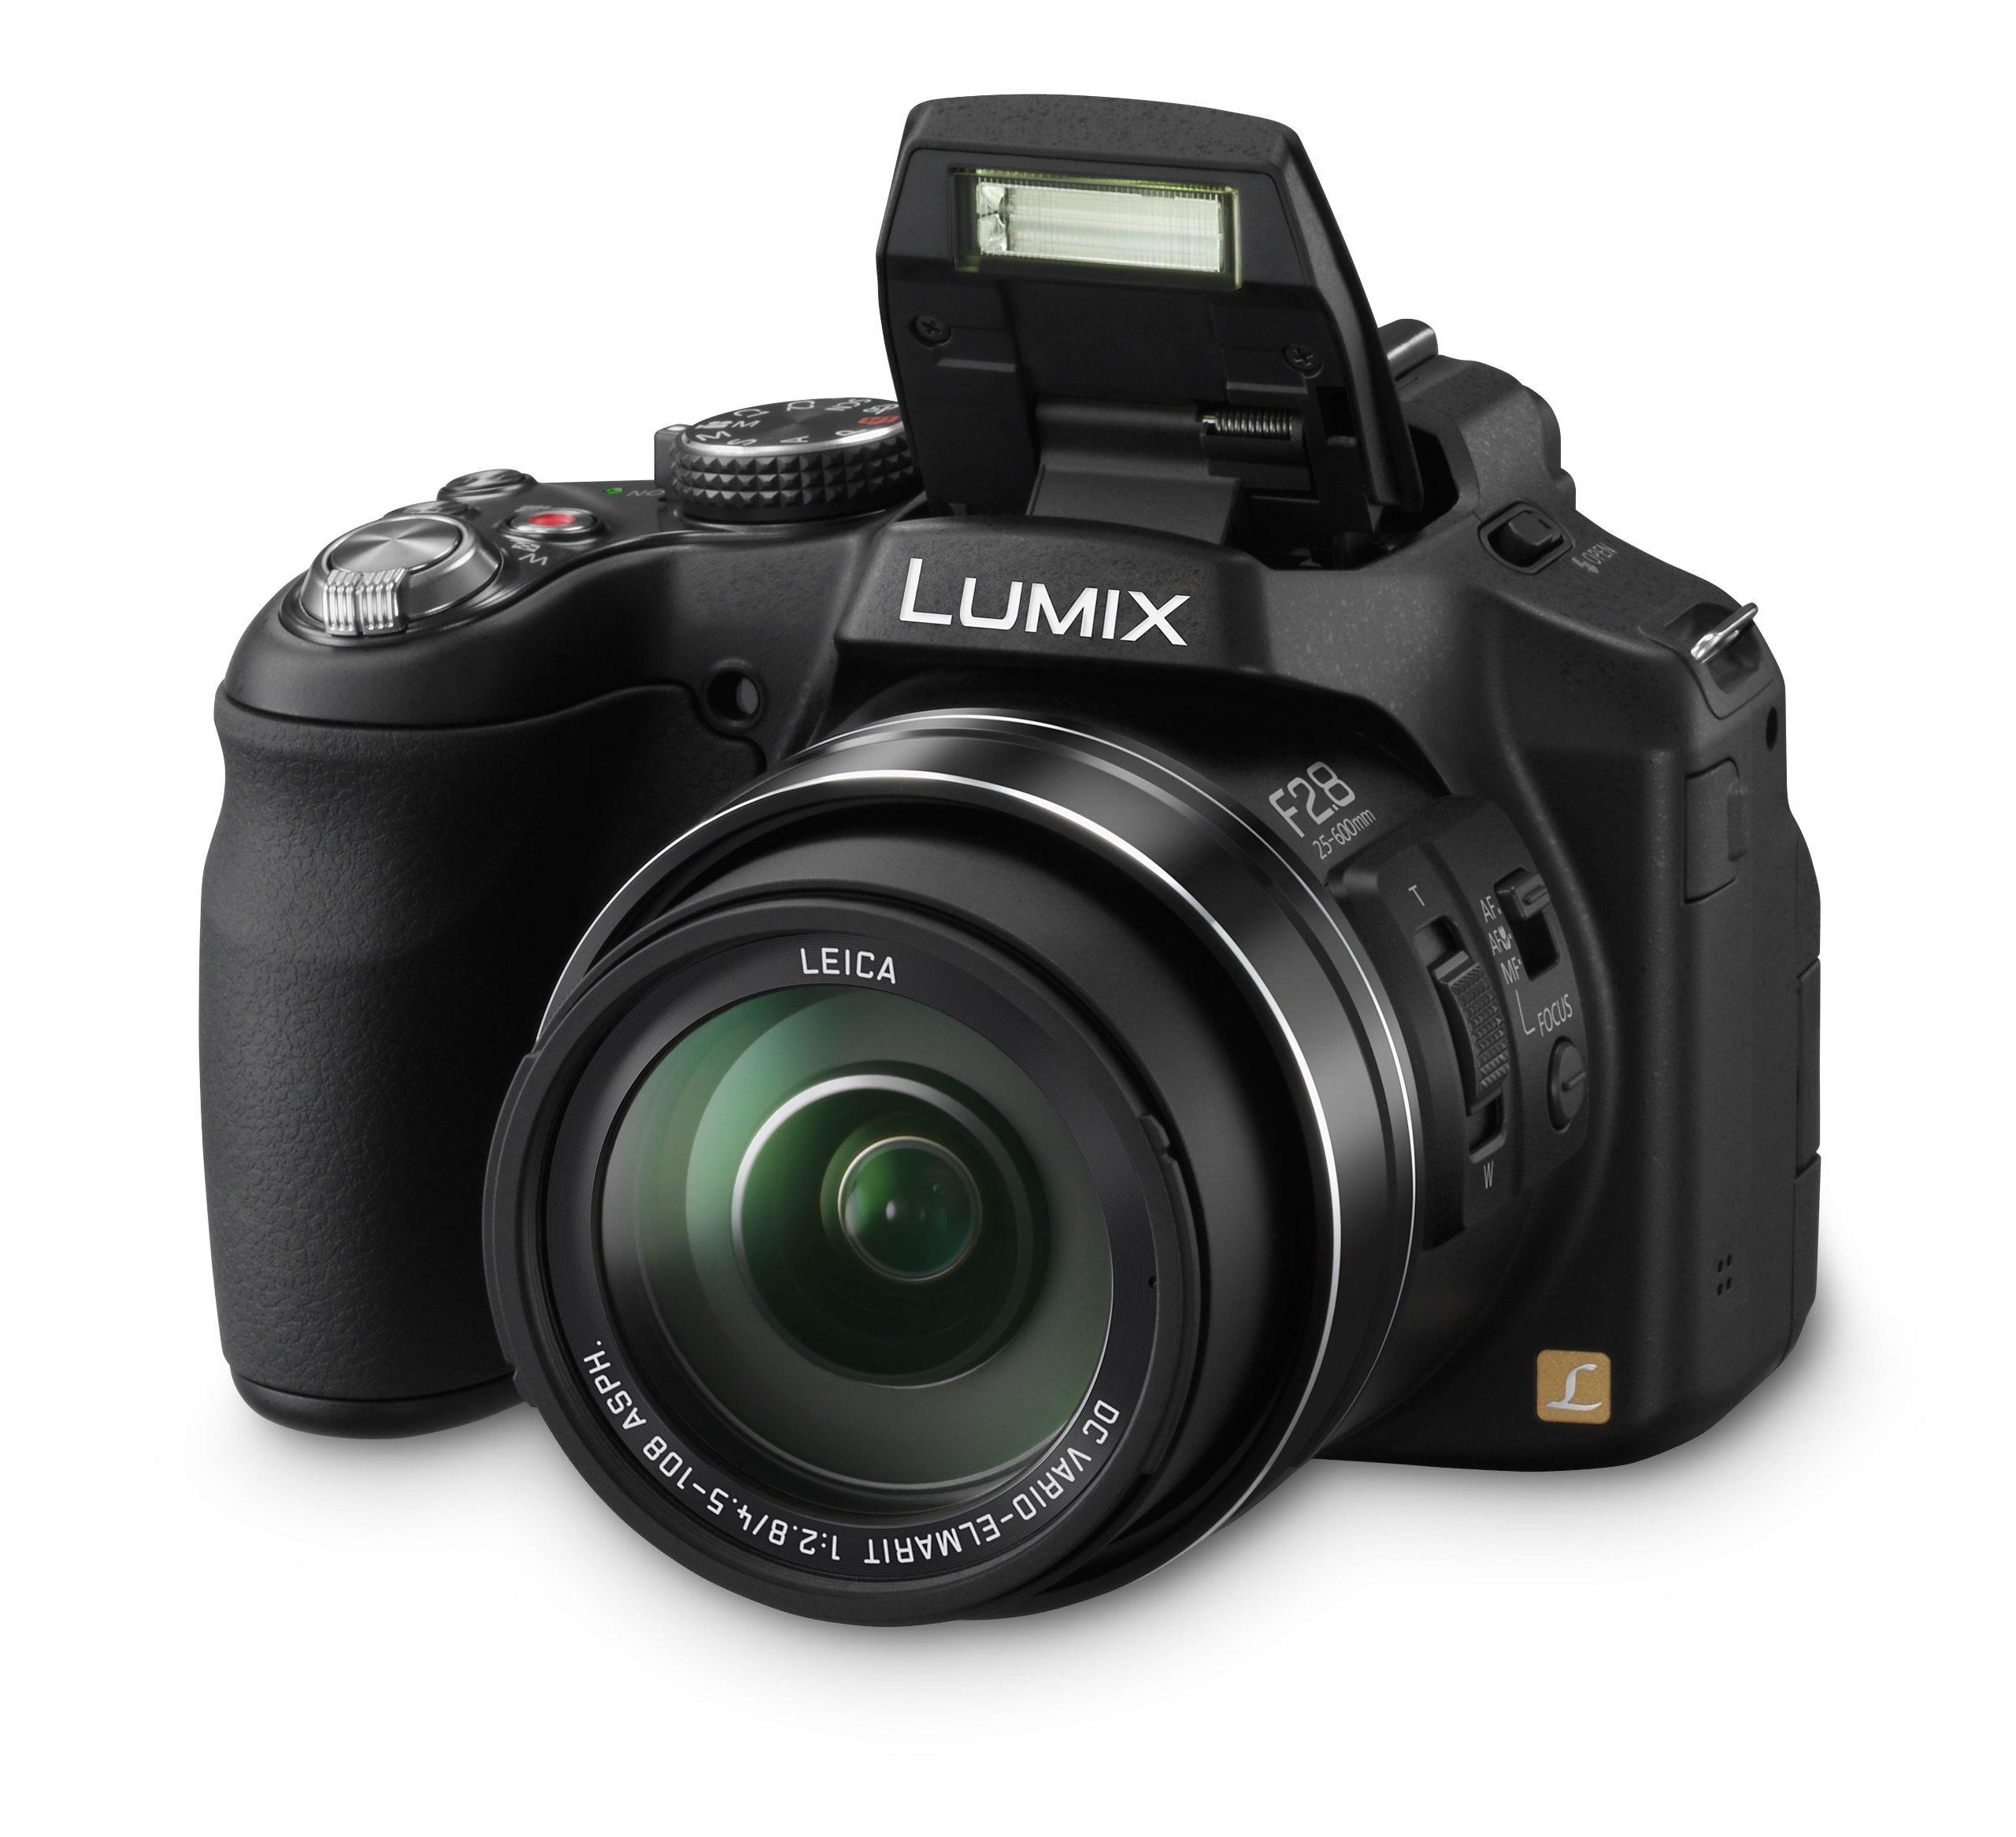 Panasonic Lumix FZ200 Fotocamera Digitale Sensore CMOS, 1/2.3, 12.80 Megapixel Reali, 12.10 Megapixel Effettivi product image